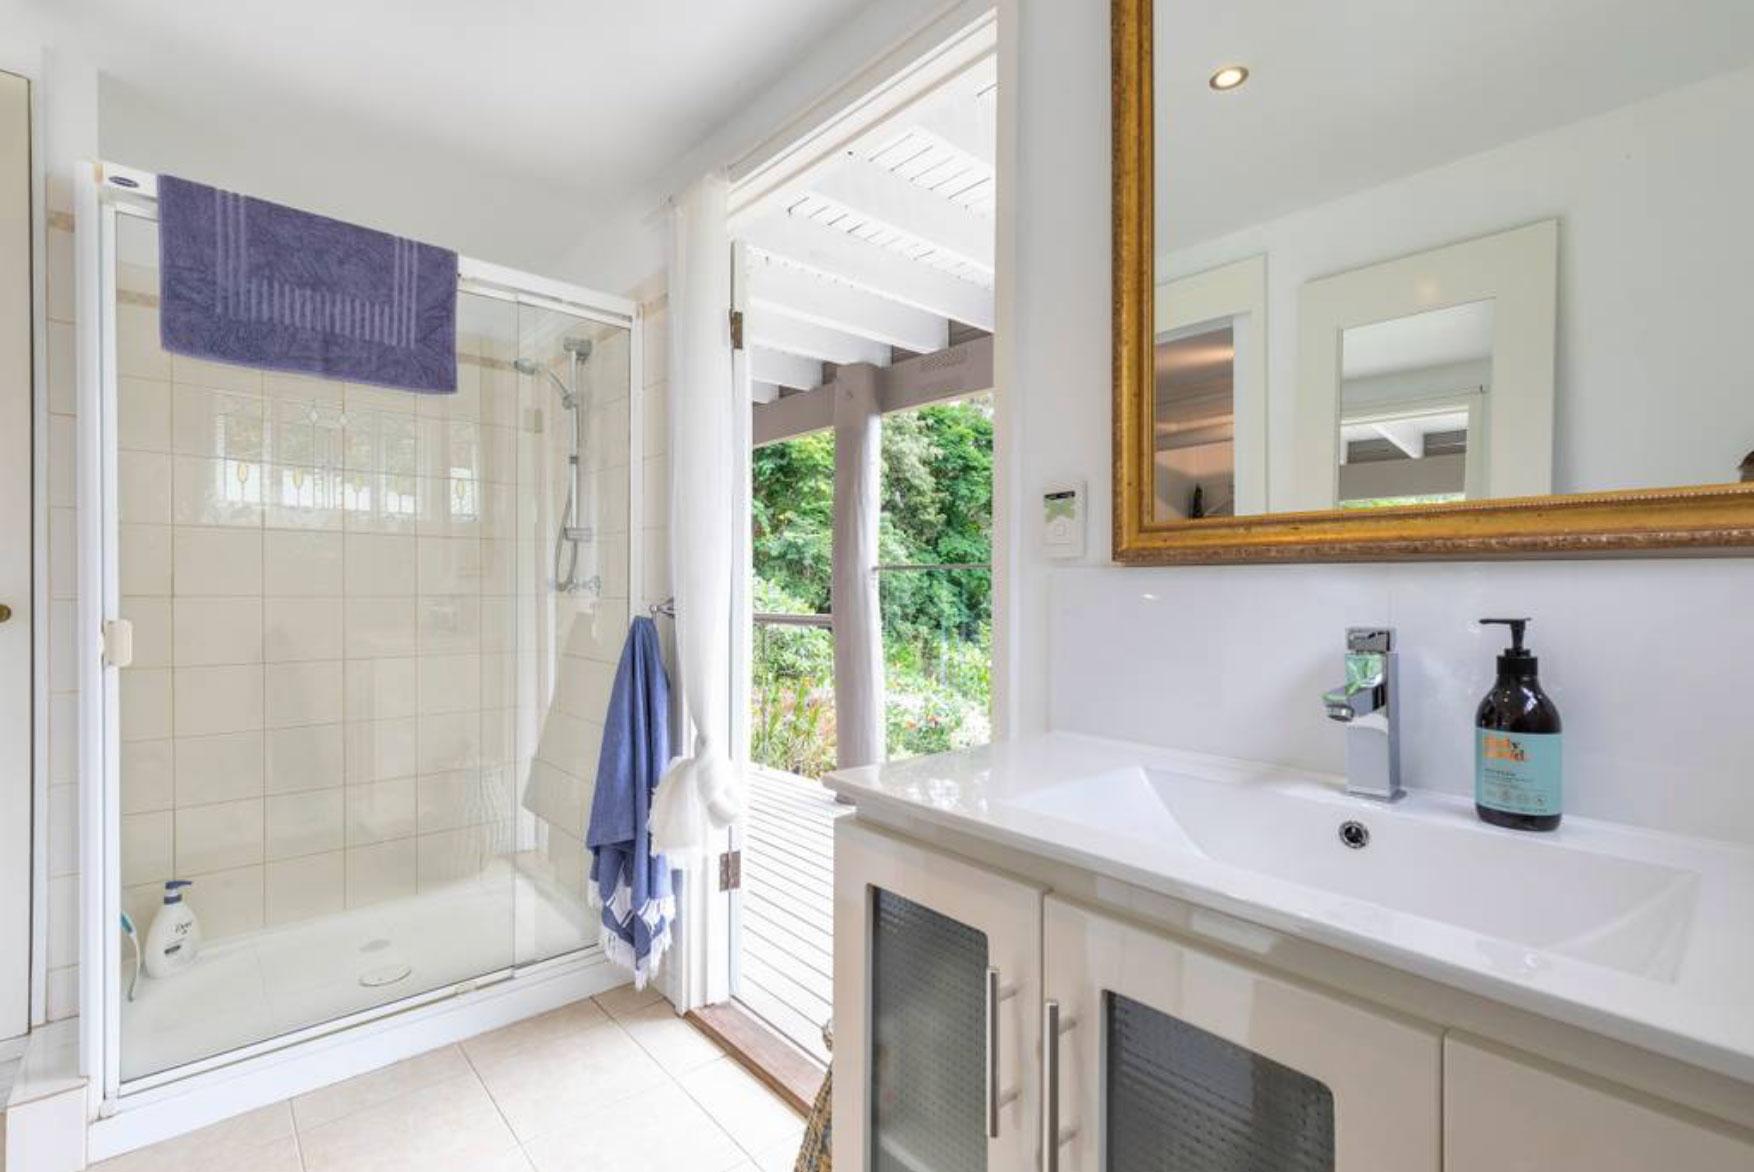 airbnb-apartment5.jpg